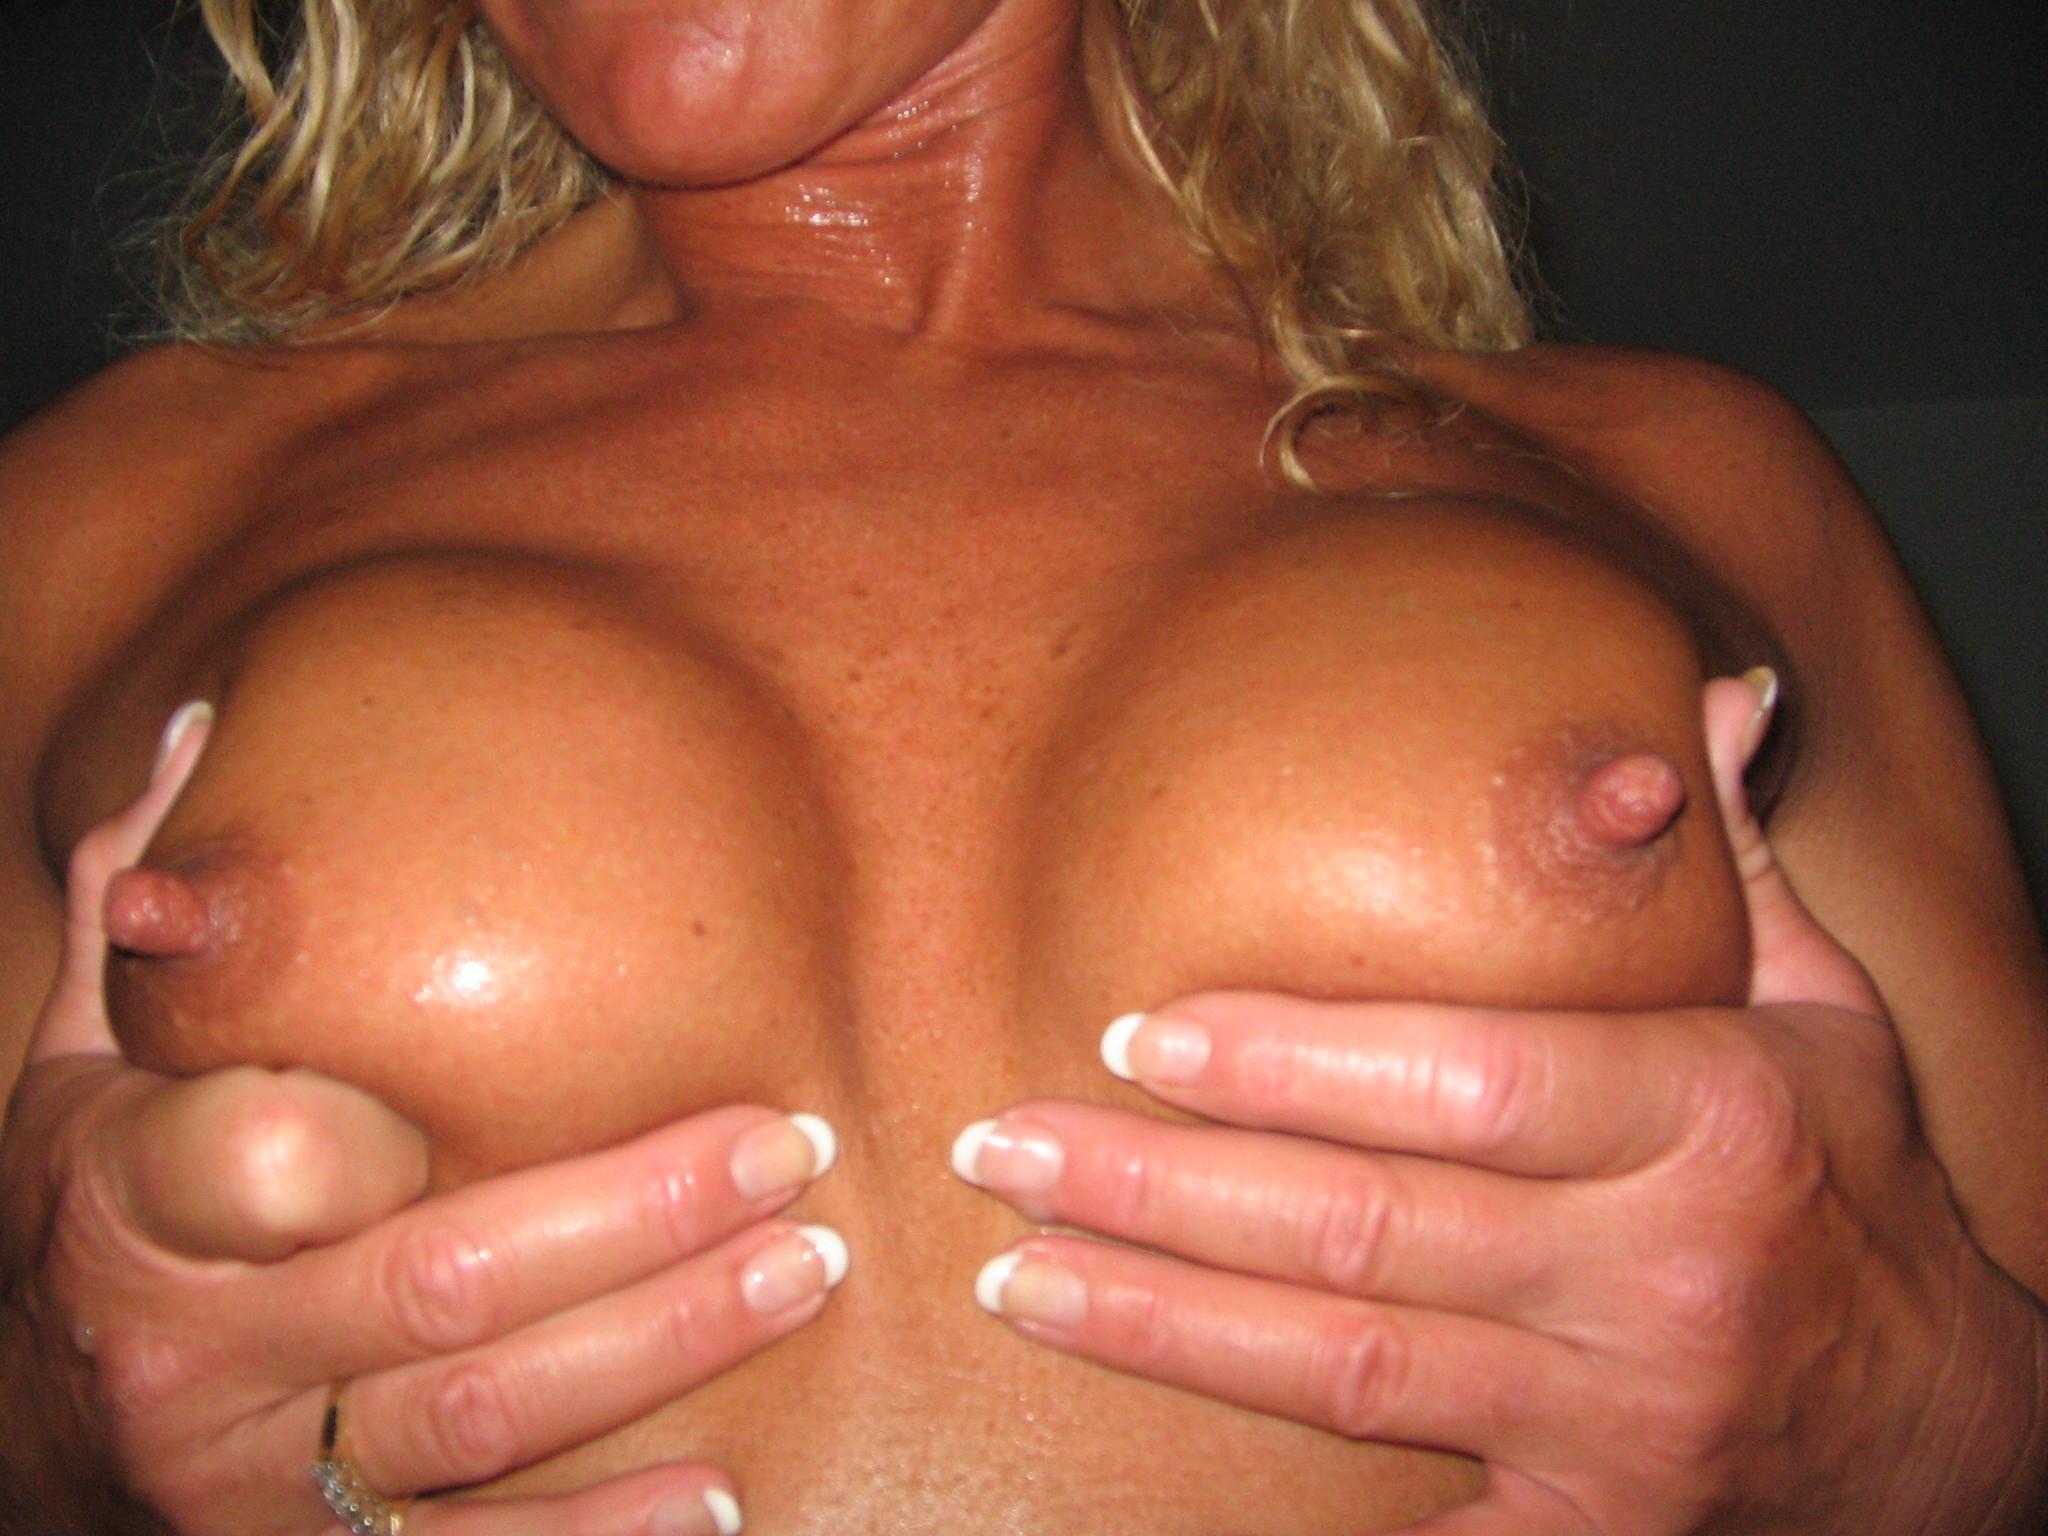 nadia virgin shows pussy